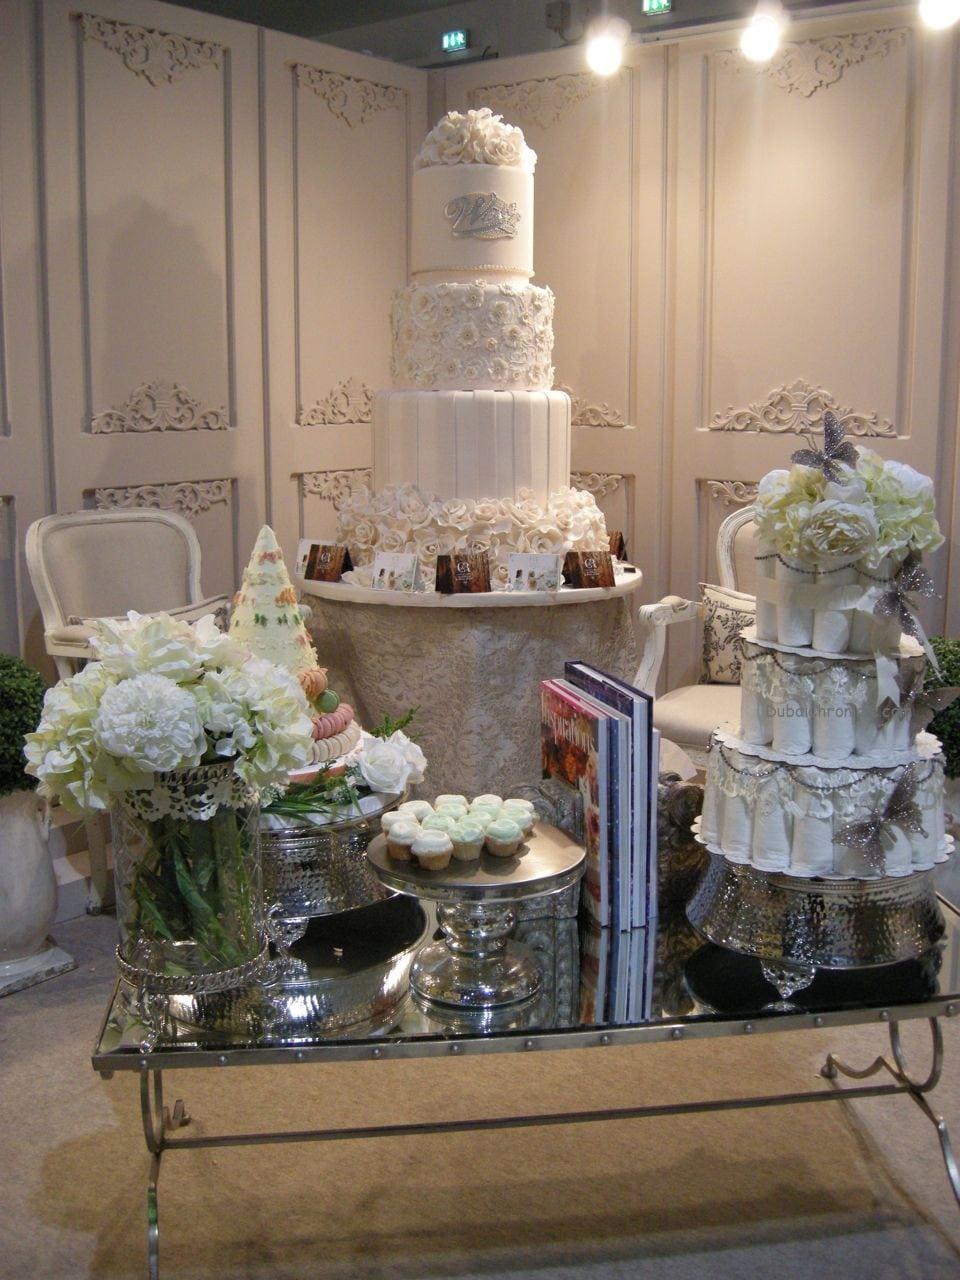 Bride Show Dubai - Candels & Rings 1